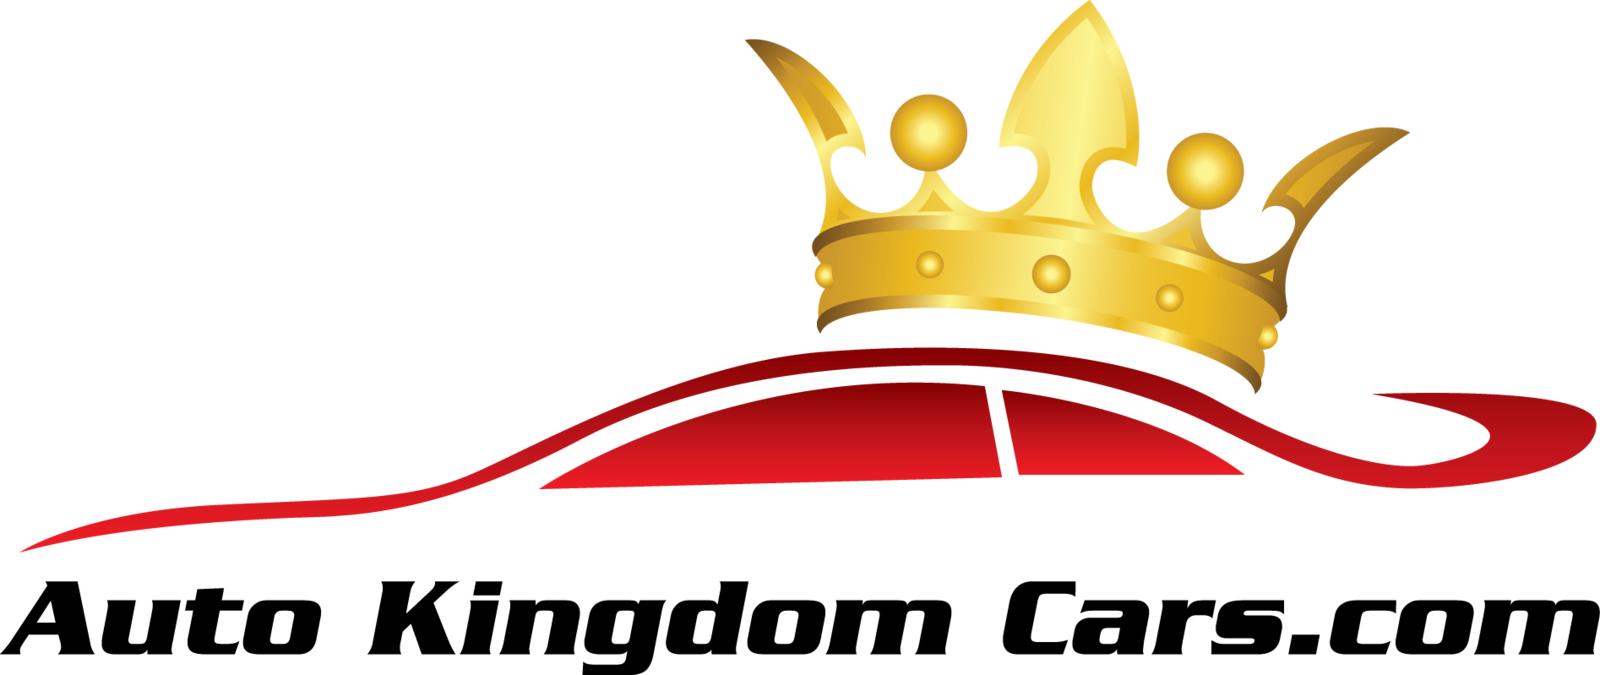 Auto Kingdom Minneapolis Mn Read Consumer Reviews